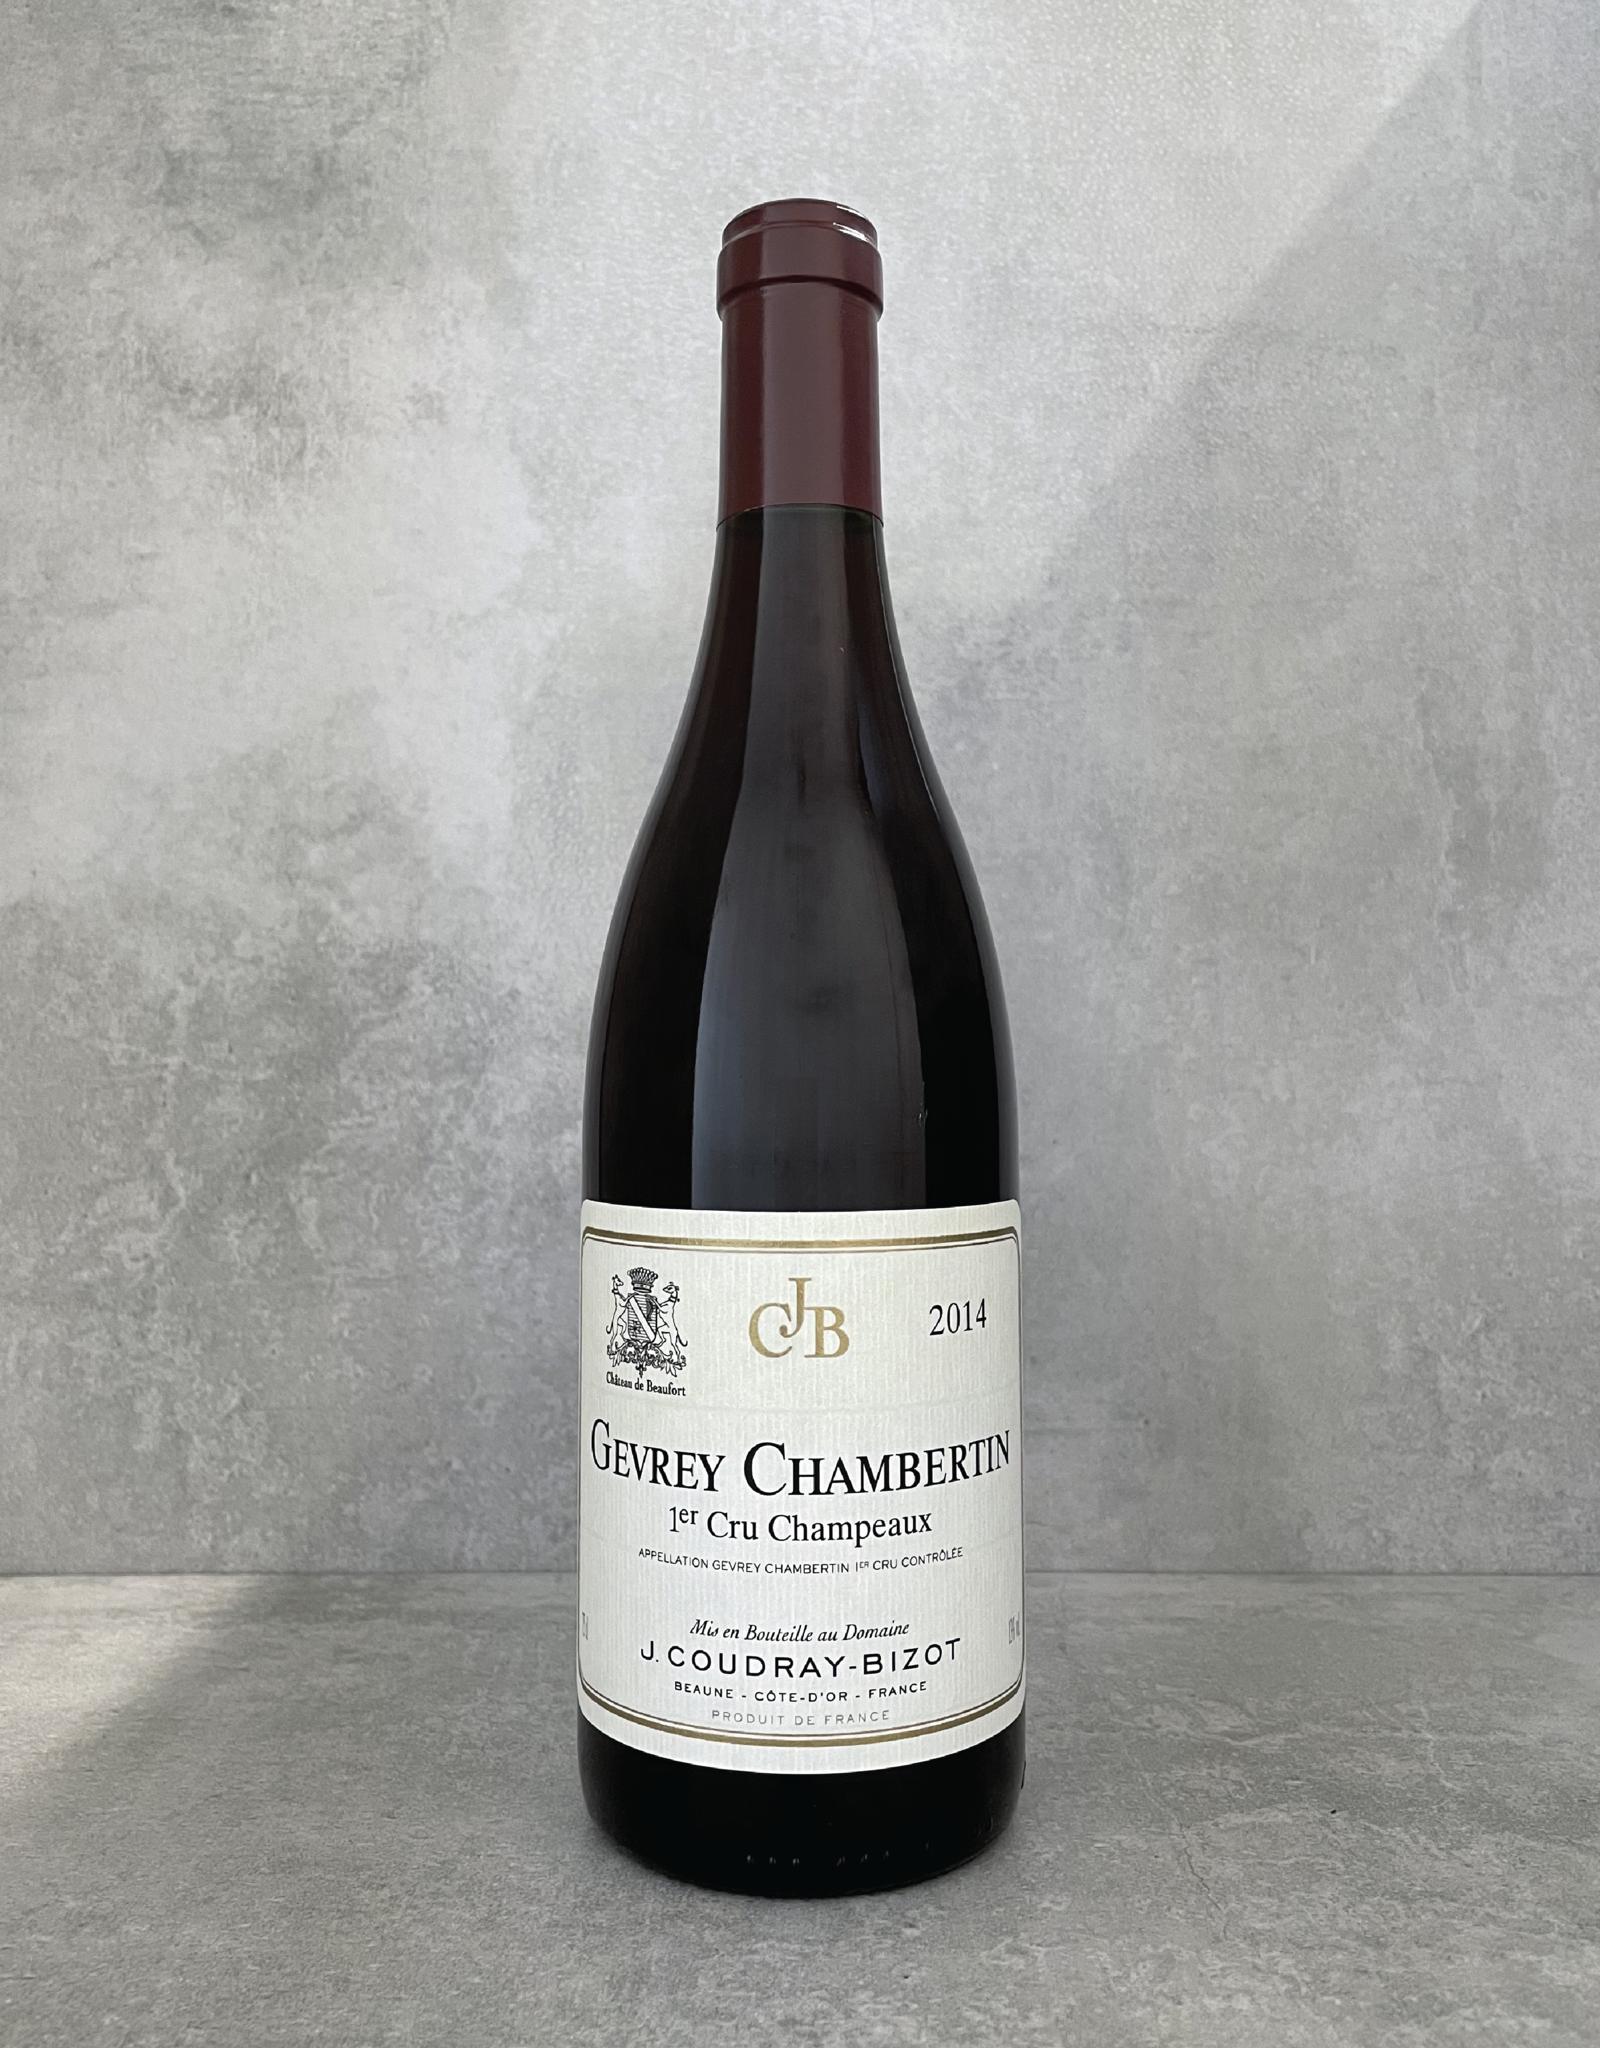 Domaine Coudray-Bizot Gevrey Chambertin 1er Cru Champeaux 2010